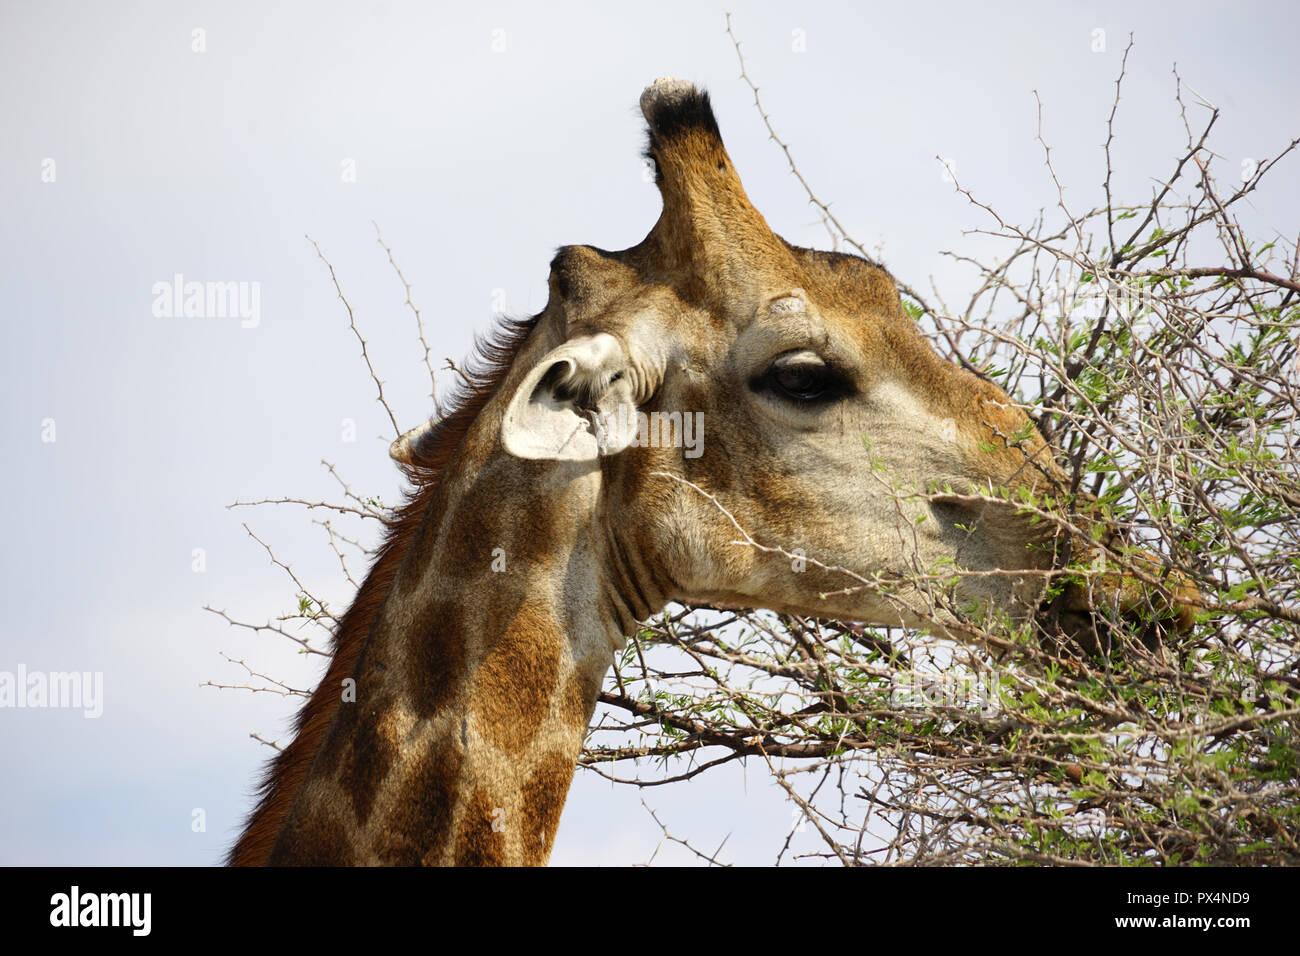 Giraffe frisst Blätter einer Akazie, Etosha Nationalpark, Republik Namibia, Afrika Stockbild